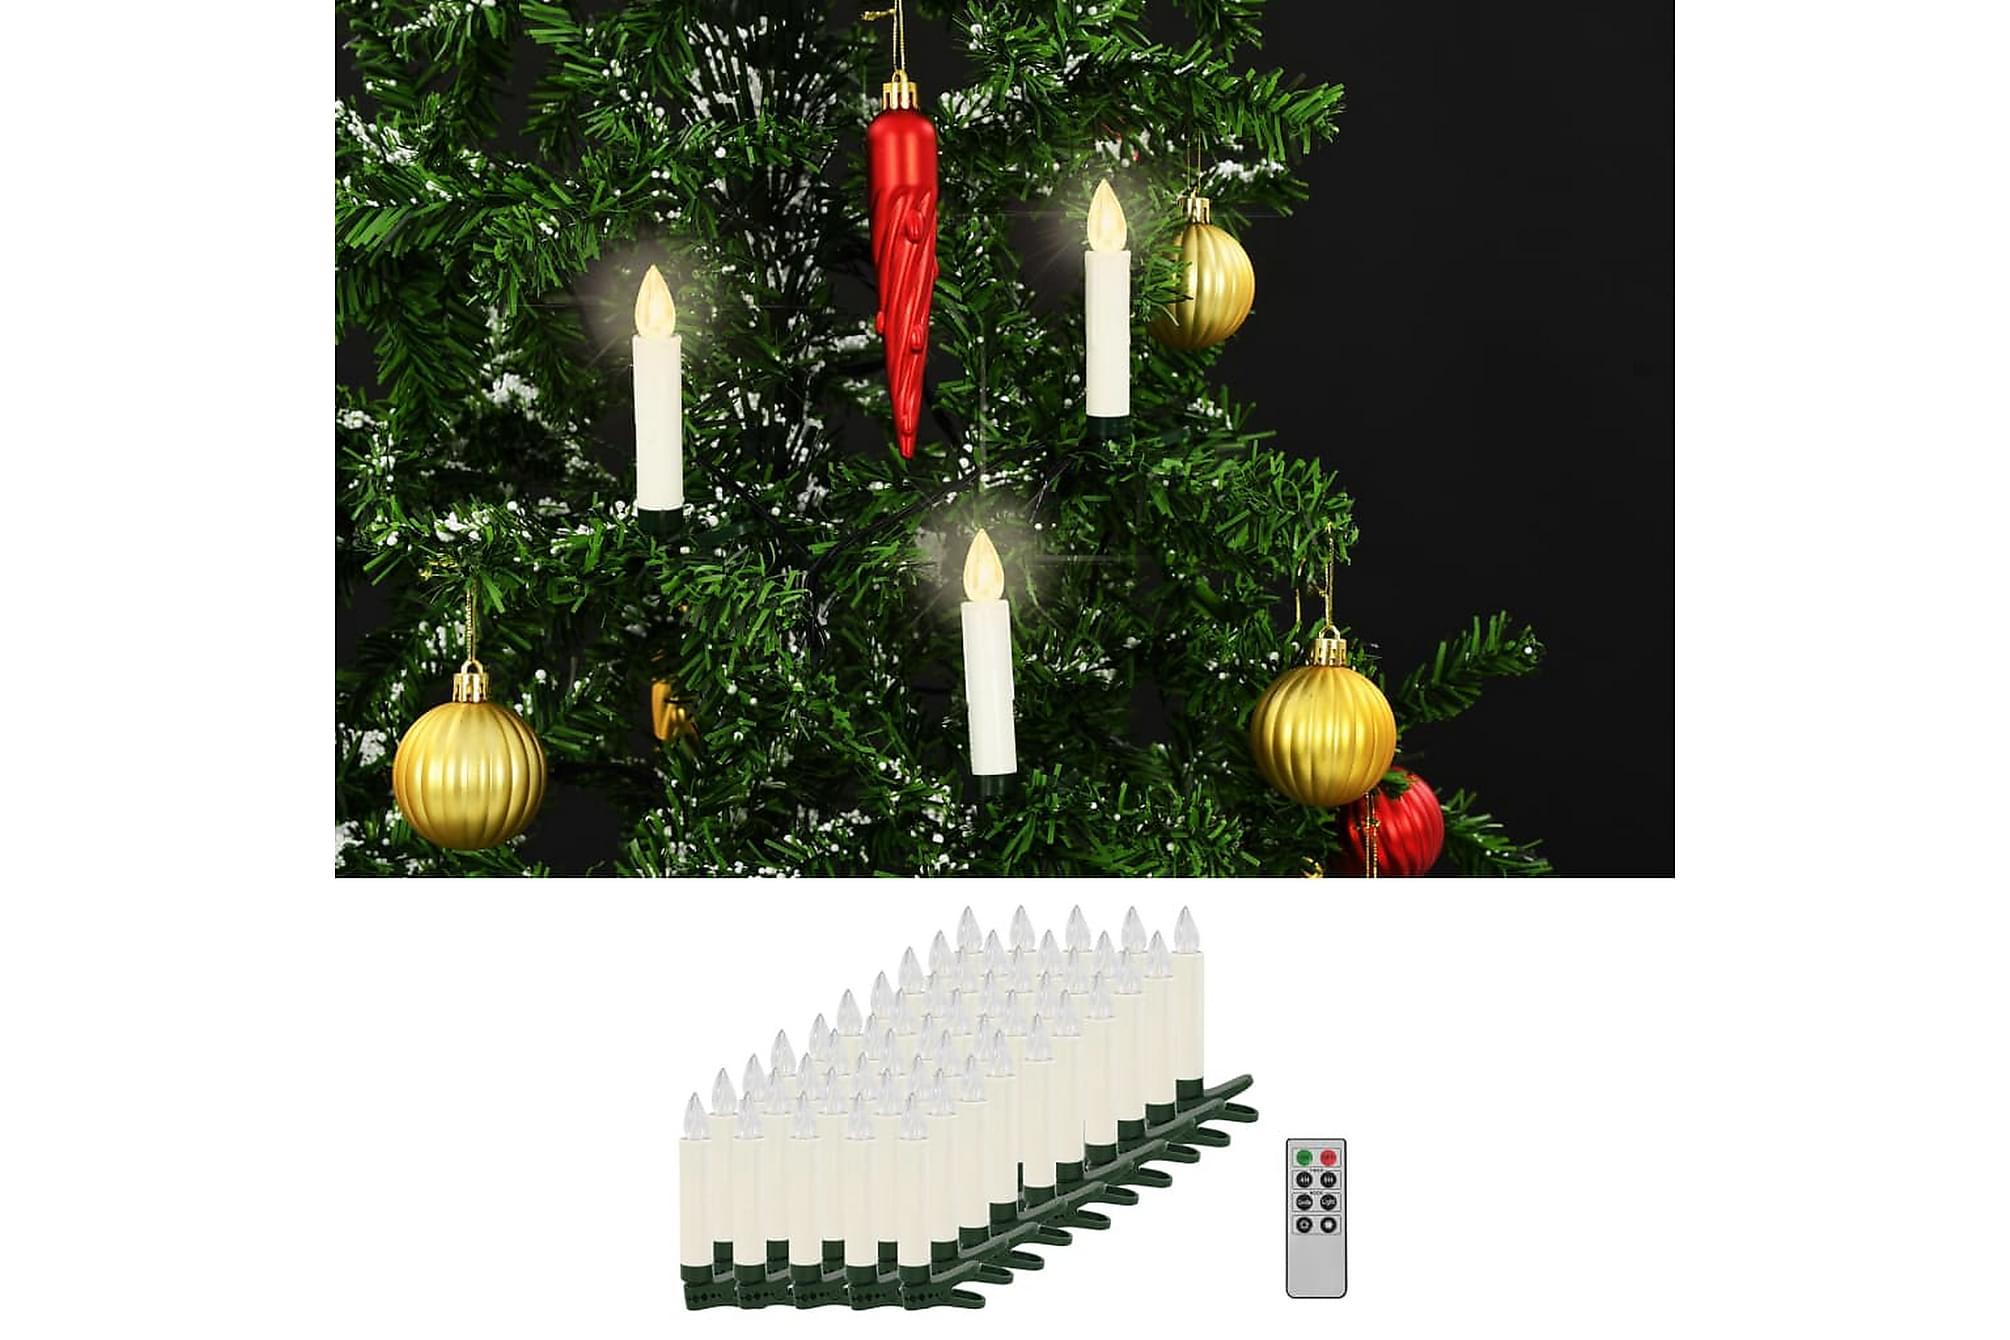 Trådlösa LED-ljus med fjärrkontroll 50 st varmvit